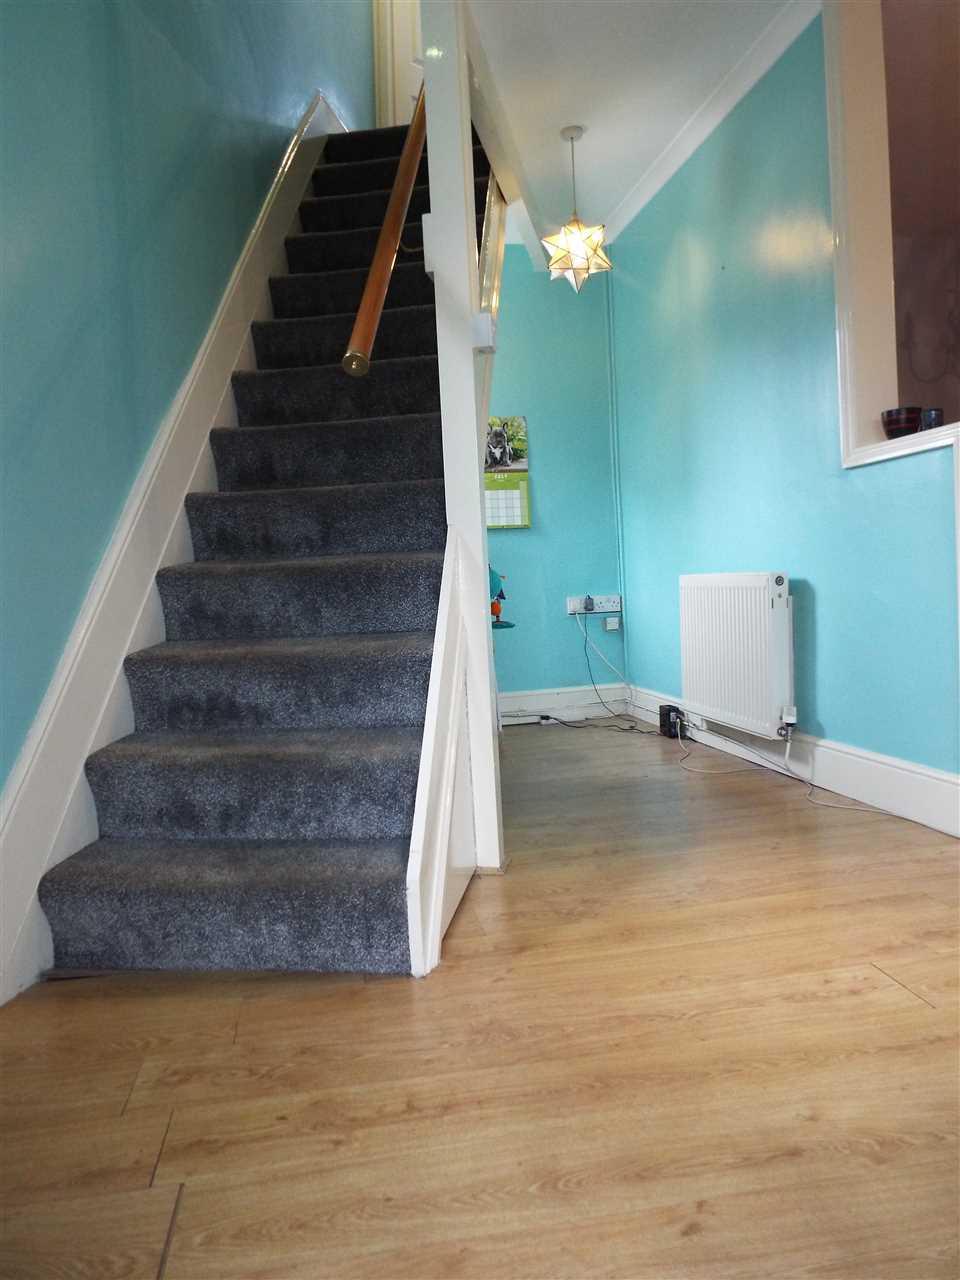 3 bed end-of-terrace for sale in Park Road, Adlington, Adlington 9